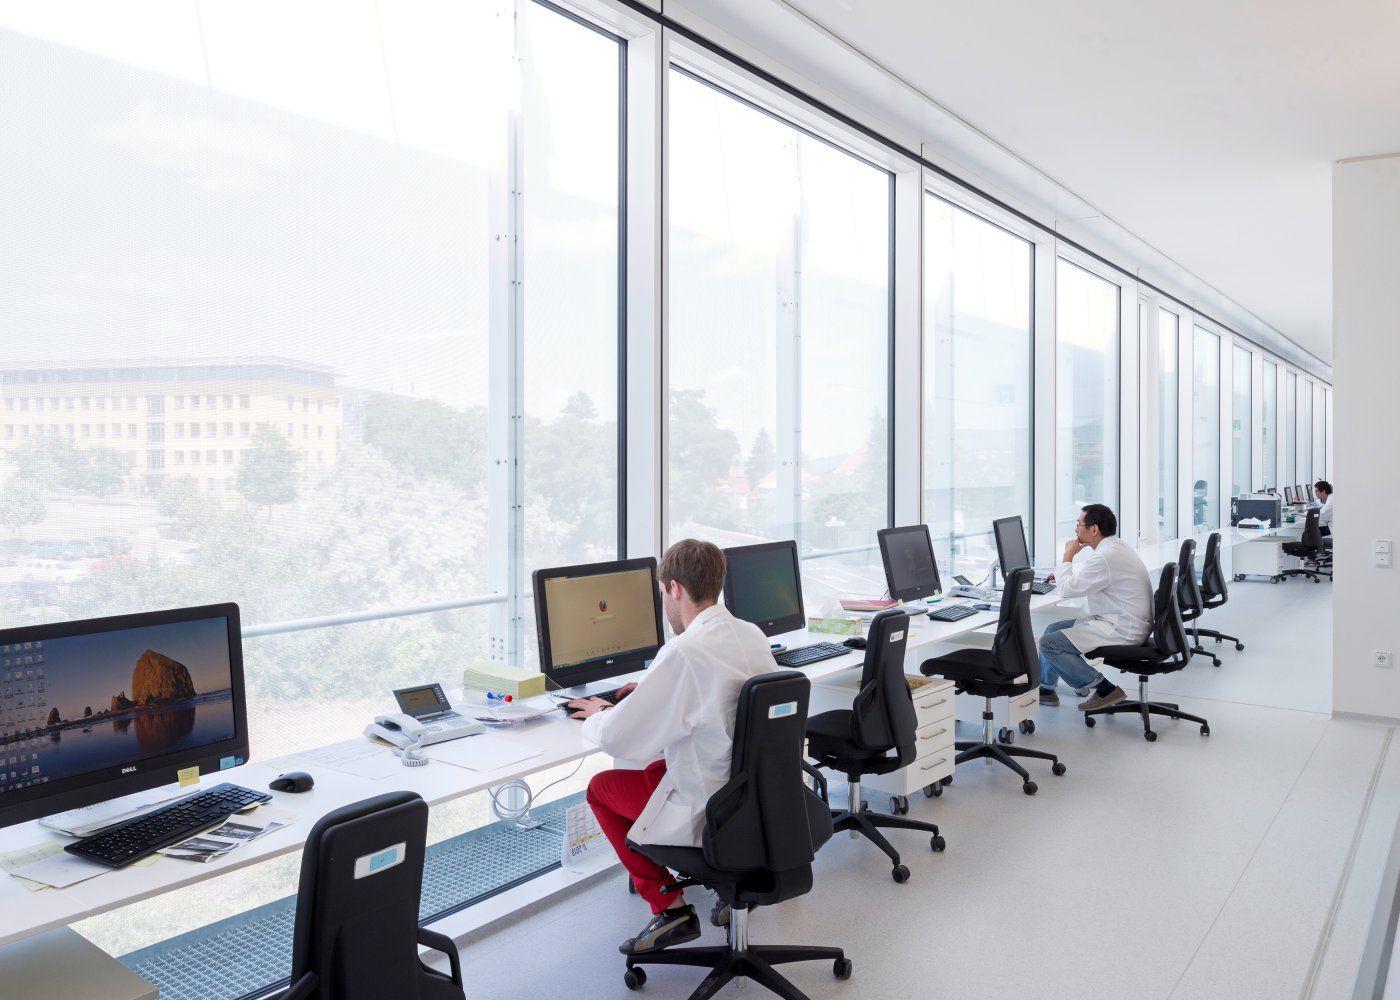 Architekten Jena ptfe screen glass hks architekten fritz lipmann institut